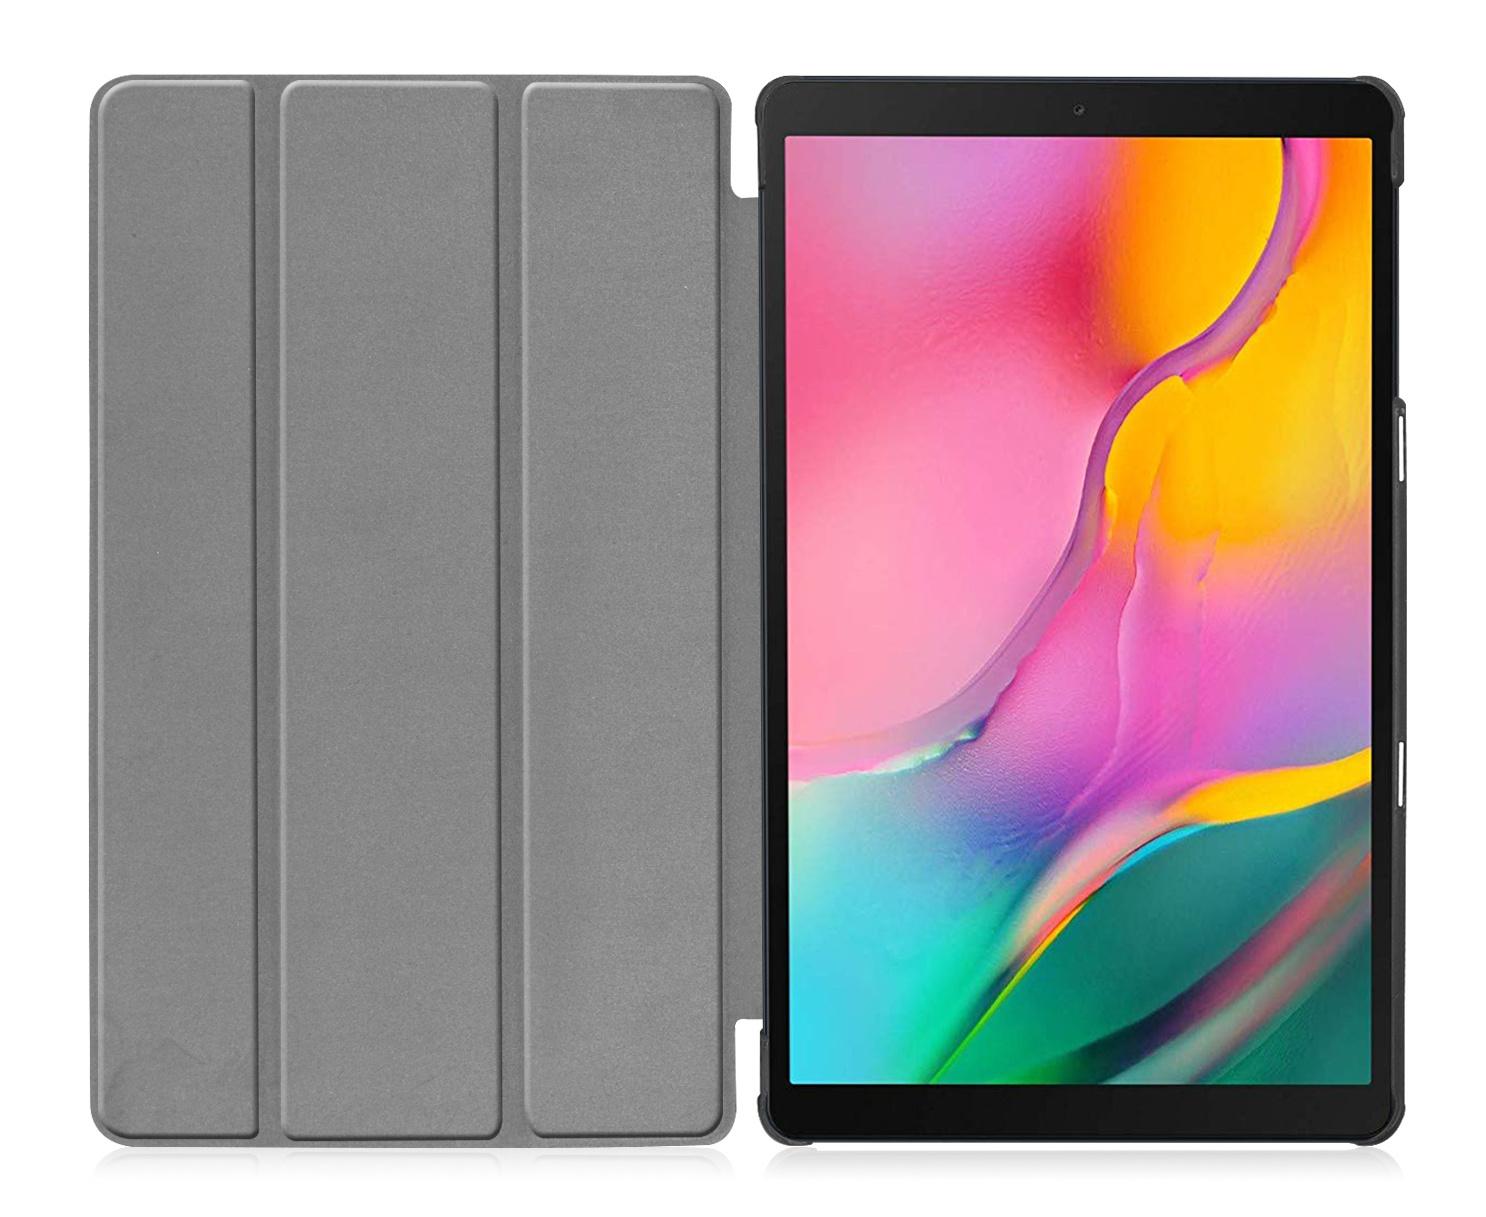 3-Vouw cover hoes Rose Goud voor de Samsung Galaxy Tab A 10.1 inch (2019)